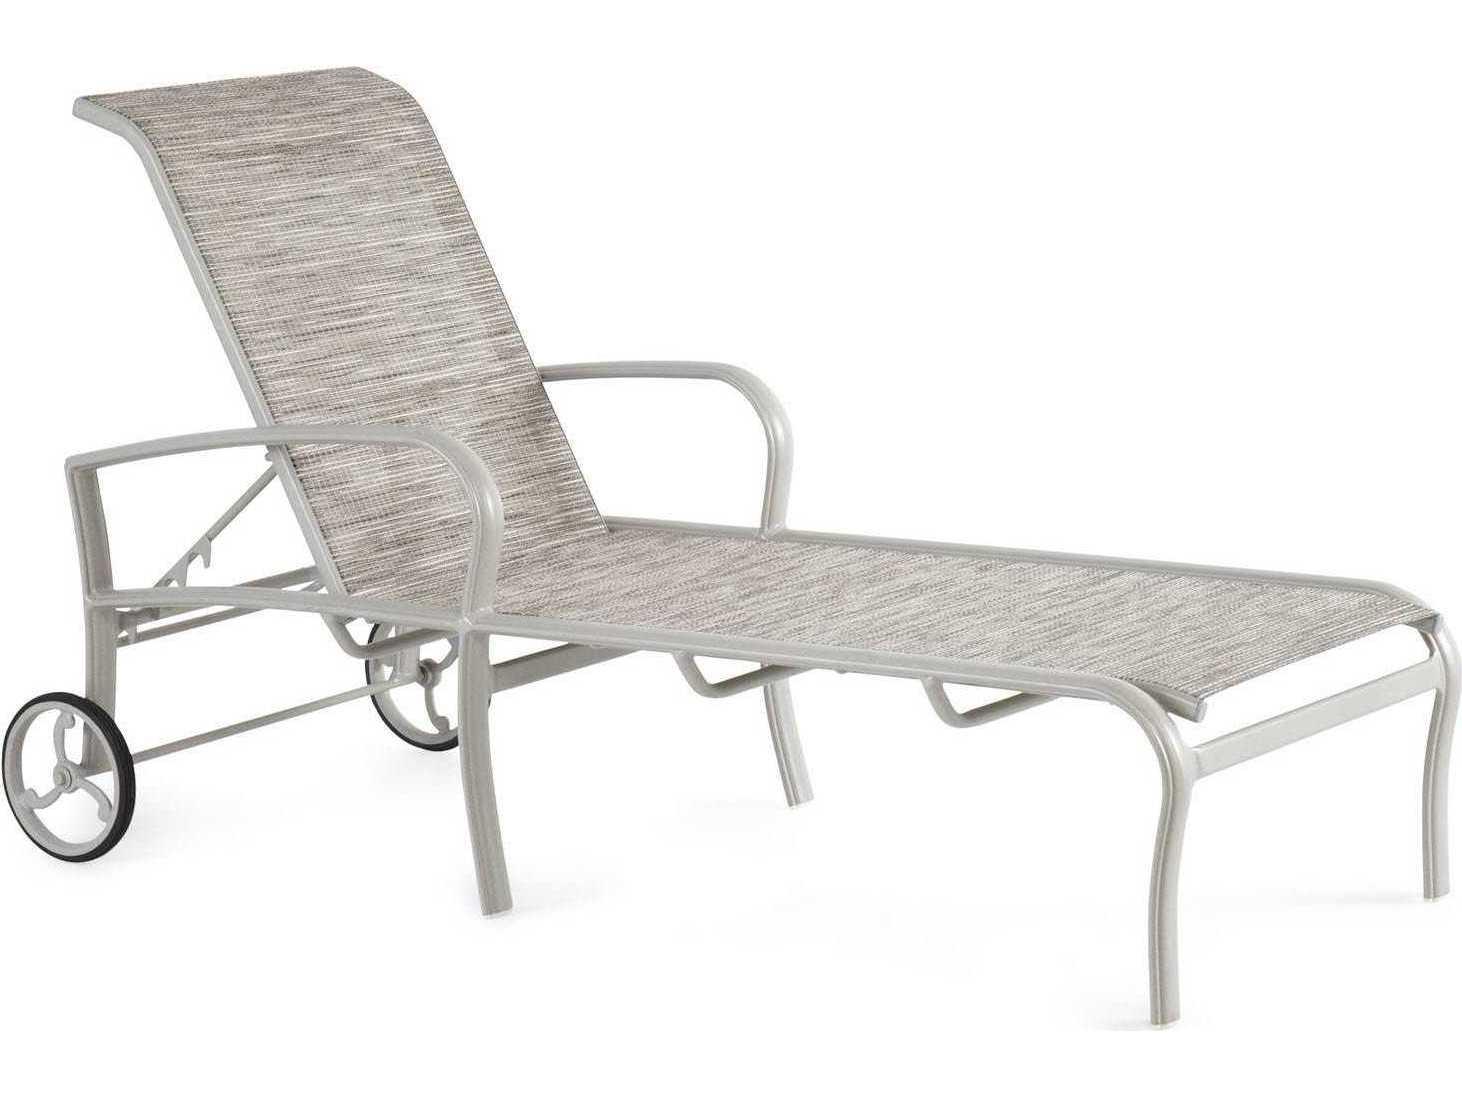 Winston Savoy Sling Aluminum Arm Chaise Lounge